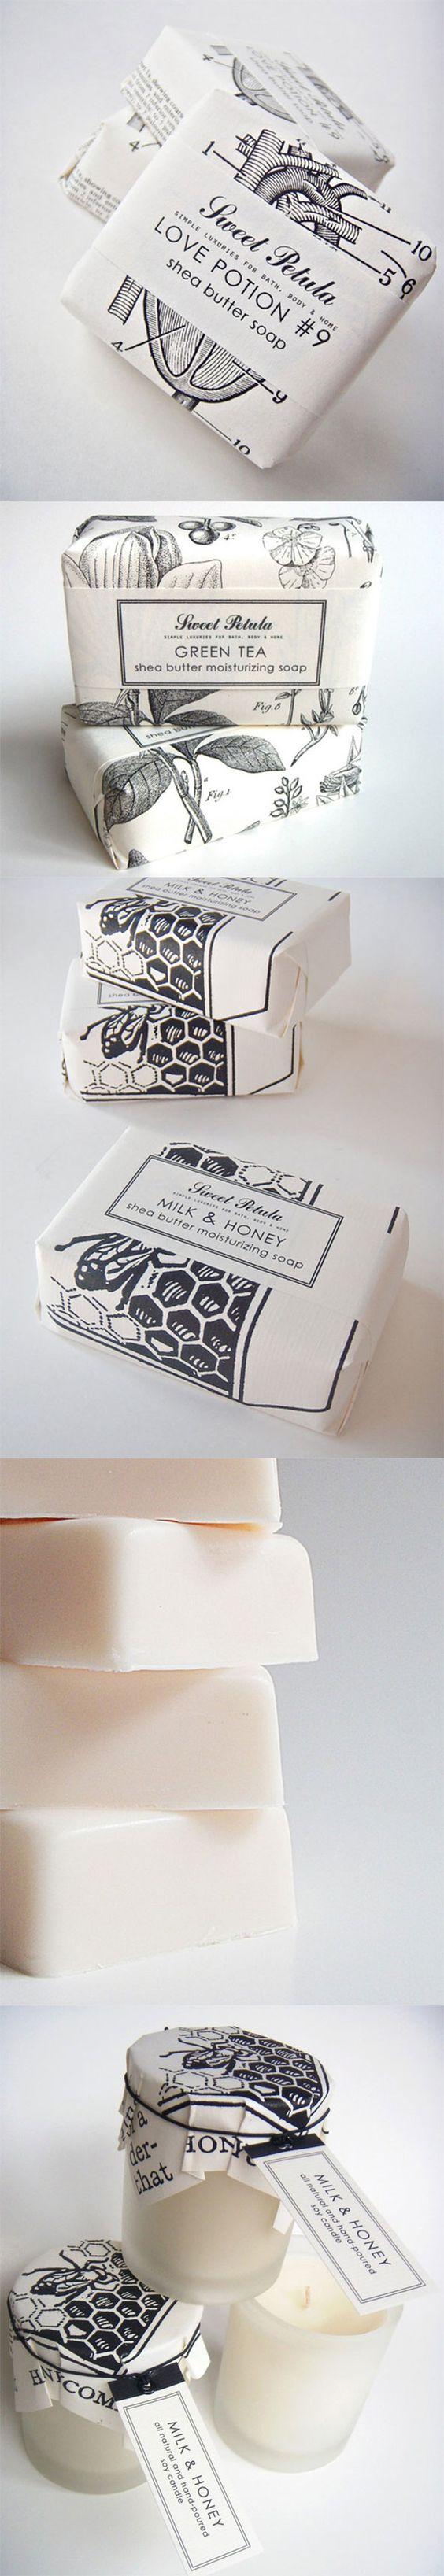 Packaging. Sweet Petula Handmade Soaps  http://sarastrand.se/blog/sweet-petula-handmade-soaps/